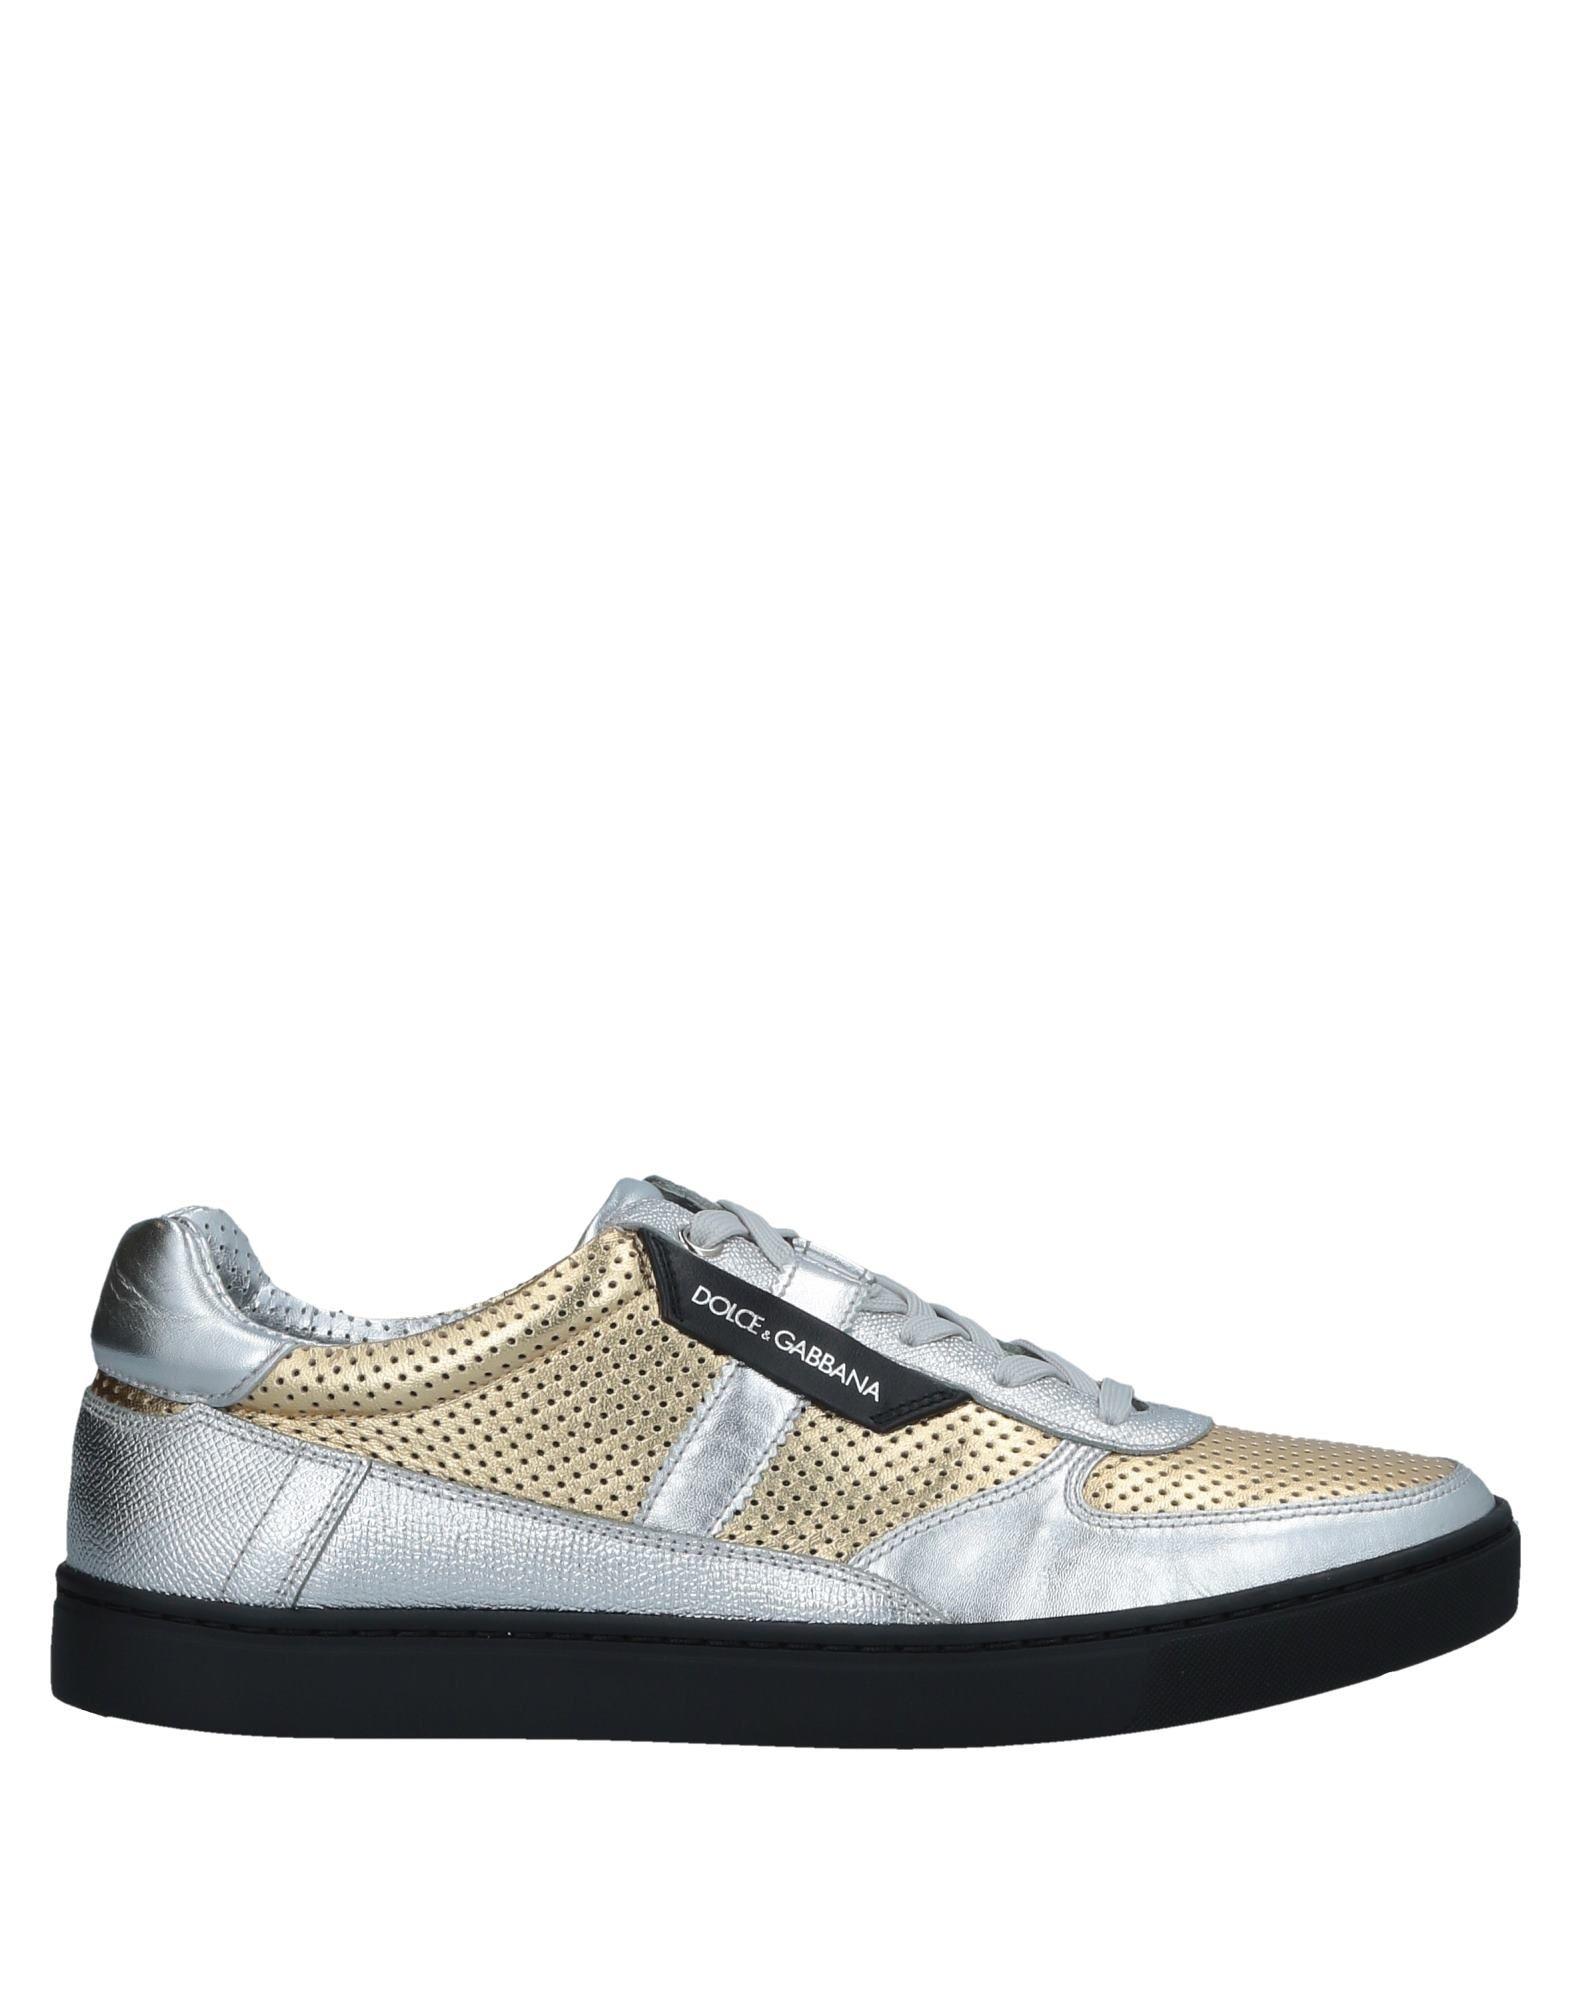 Dolce & Gabbana Sneakers Herren  11533067KQ Gute Qualität beliebte Schuhe